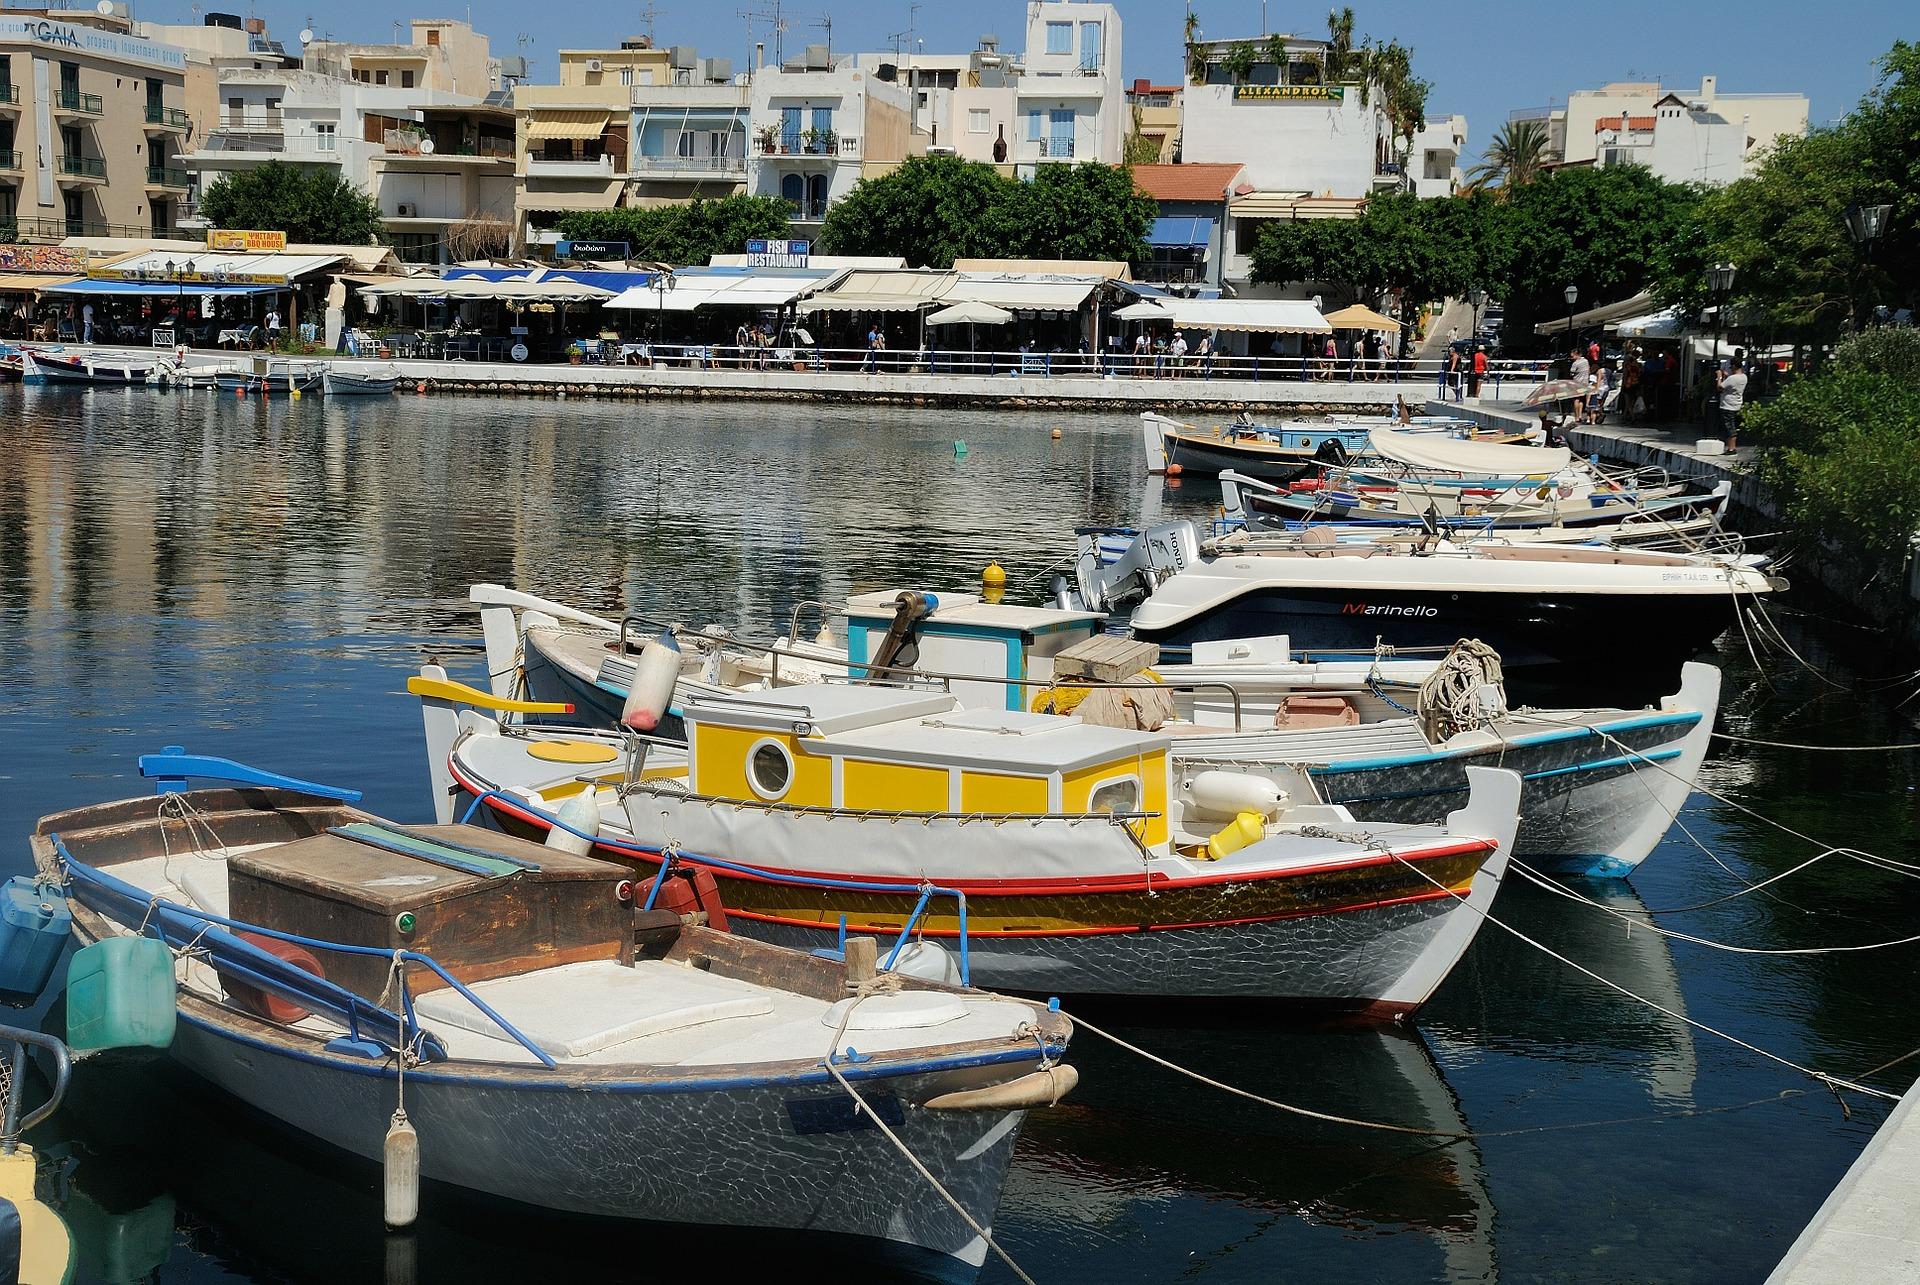 Island hopping in Greece on a budget - Agios Nikolaos Crete